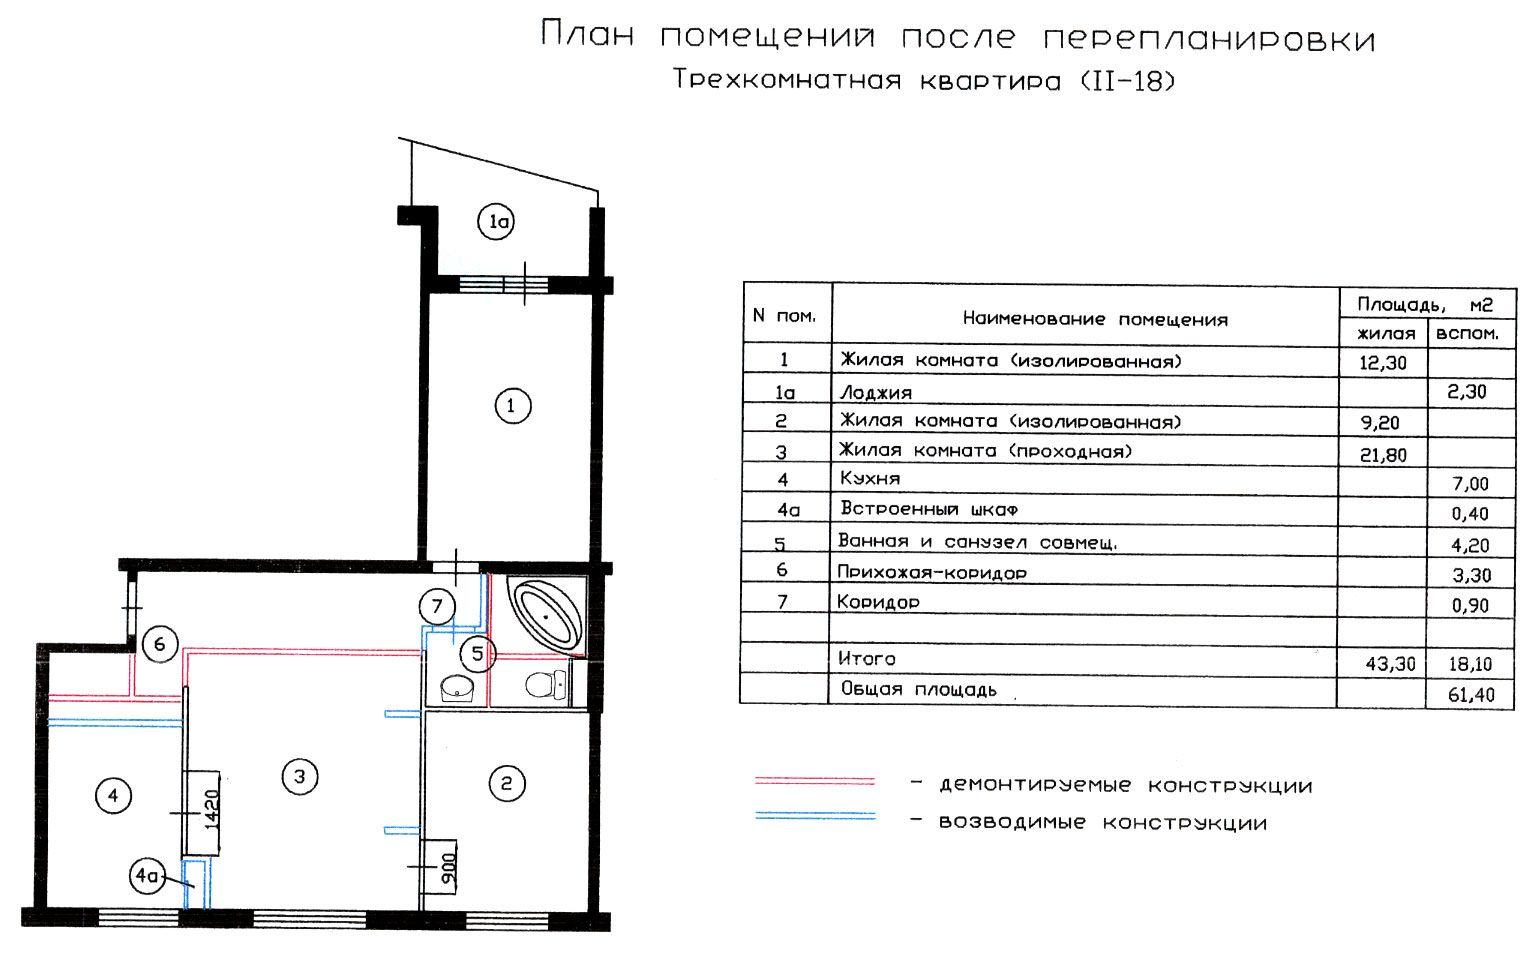 II-18 вариант перепланировки трехкомнатной квартиры